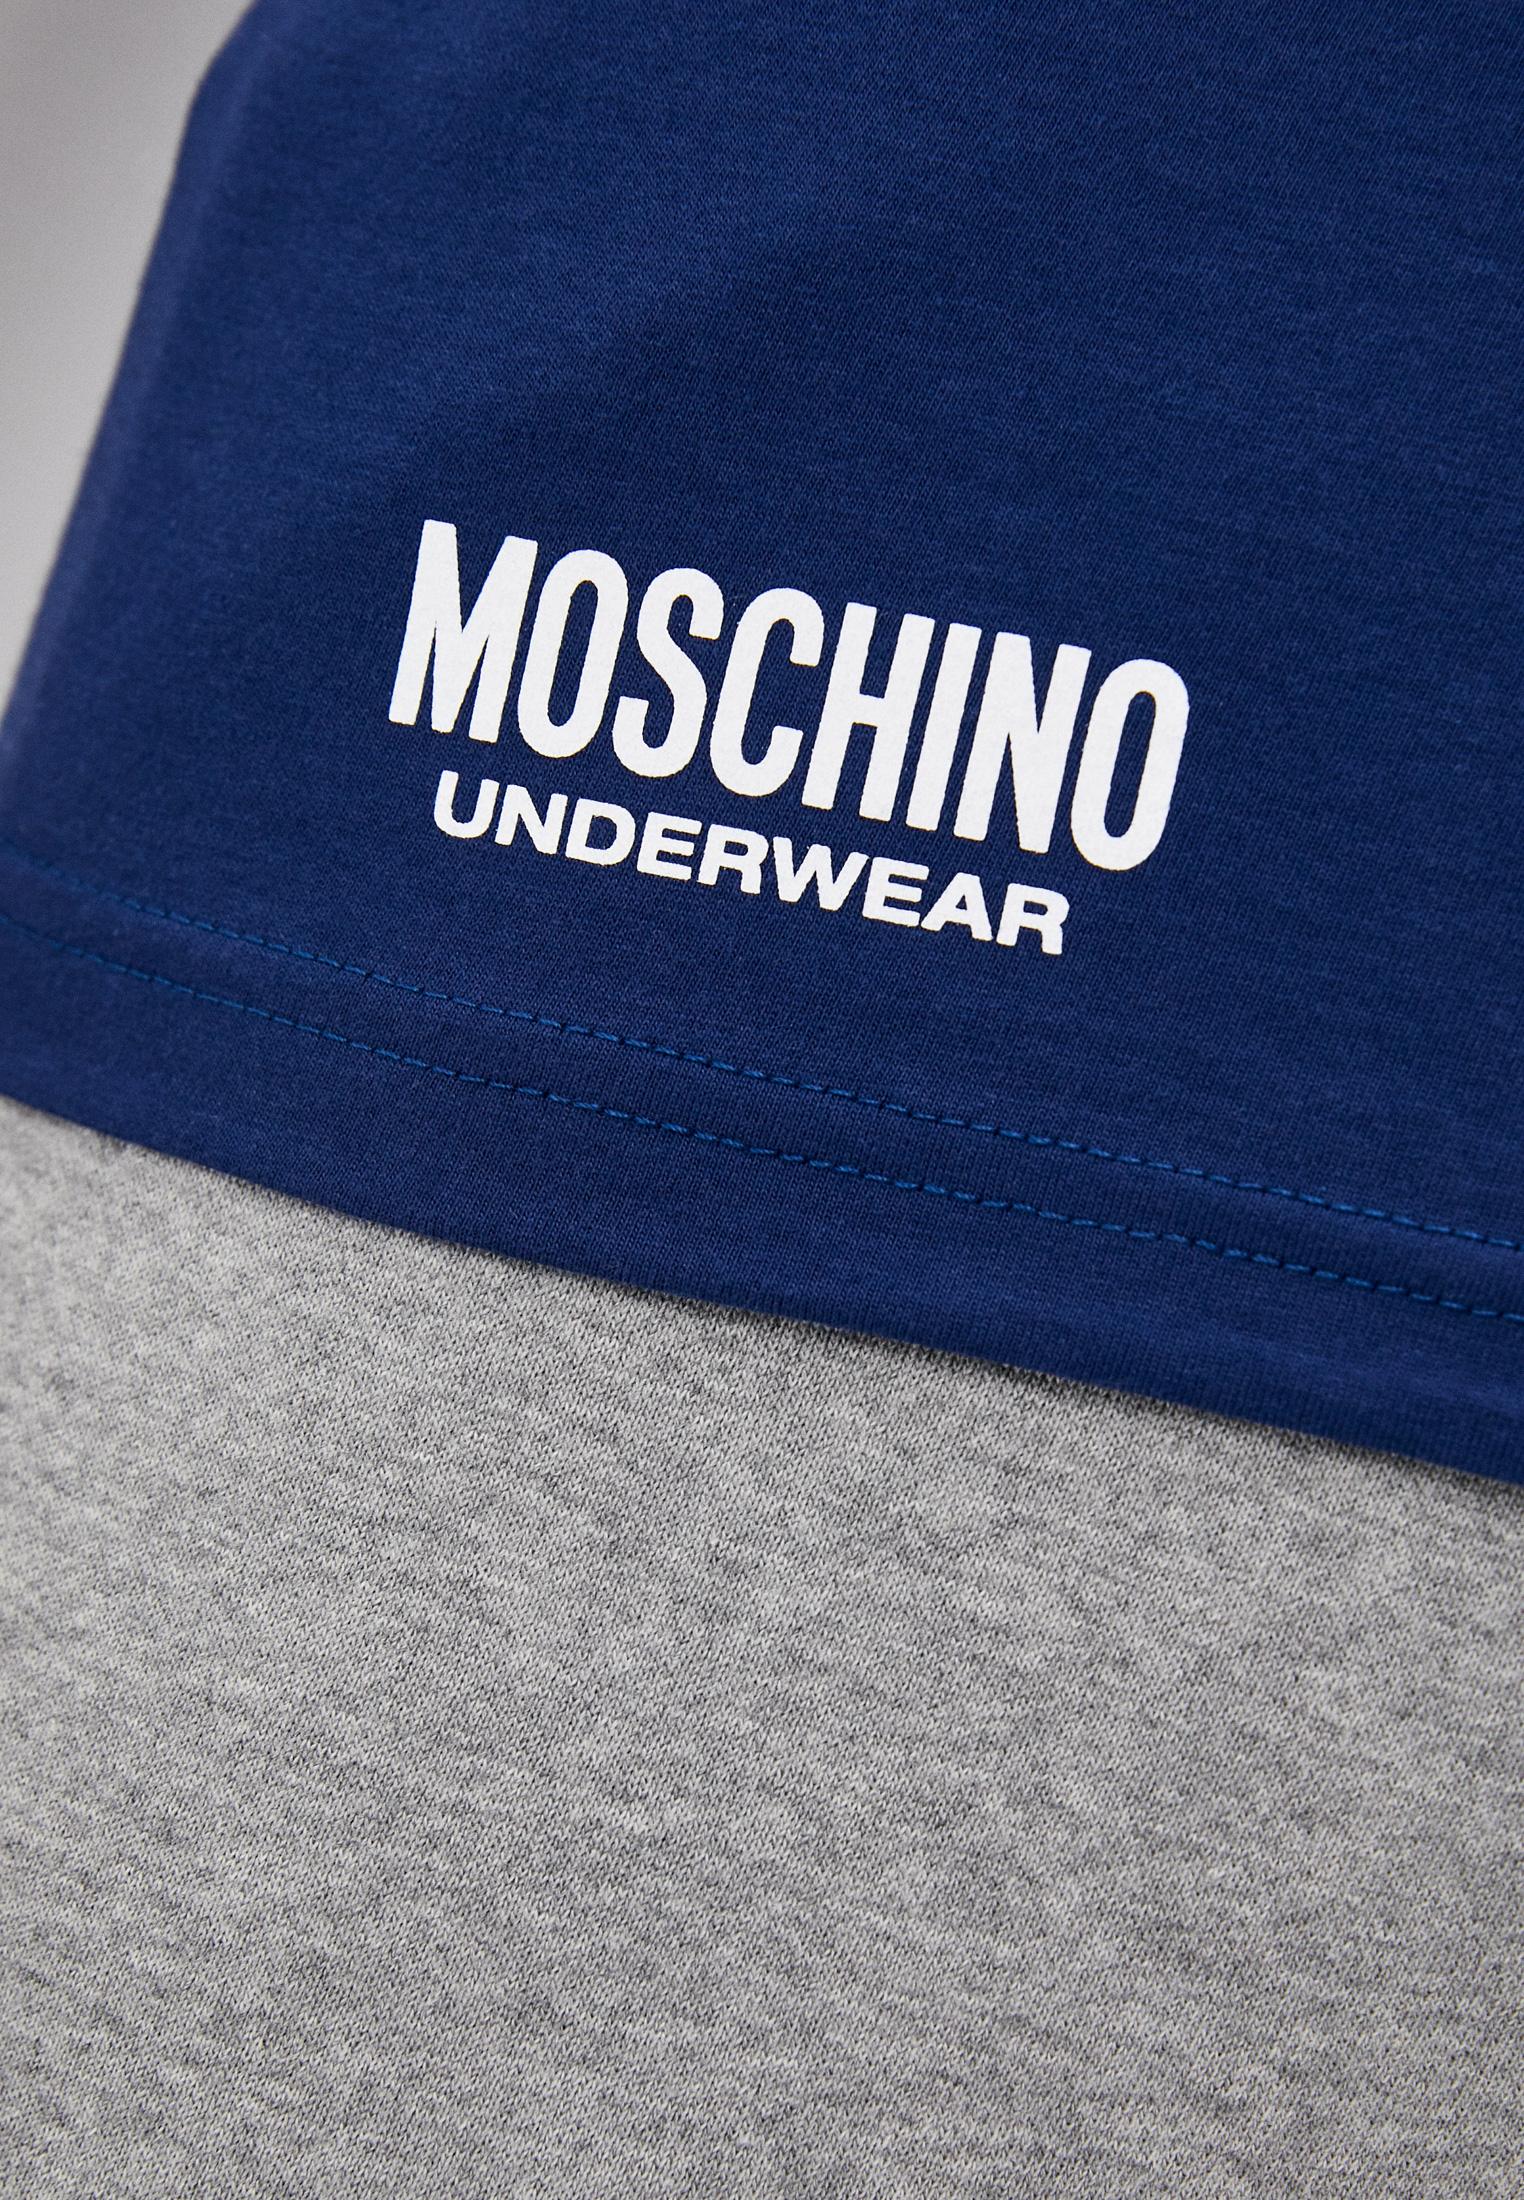 Домашняя футболка Moschino Underwear A19098114: изображение 5